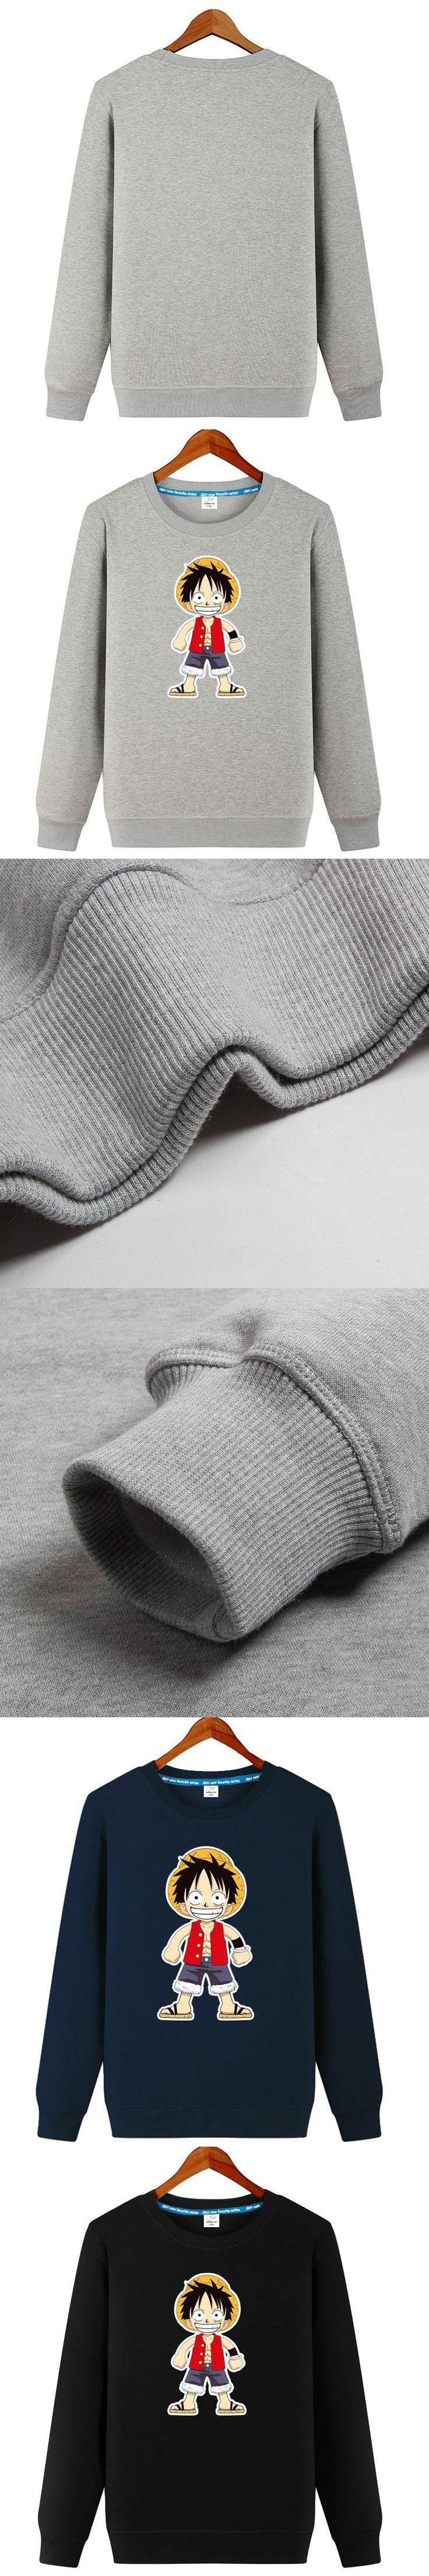 New 2017 Men Women Hoodies Anime One Piece Luffy Printed Cotton Sweatshirts Jacket DIY Custom Pattern S-5XL Casual Loose Lovers